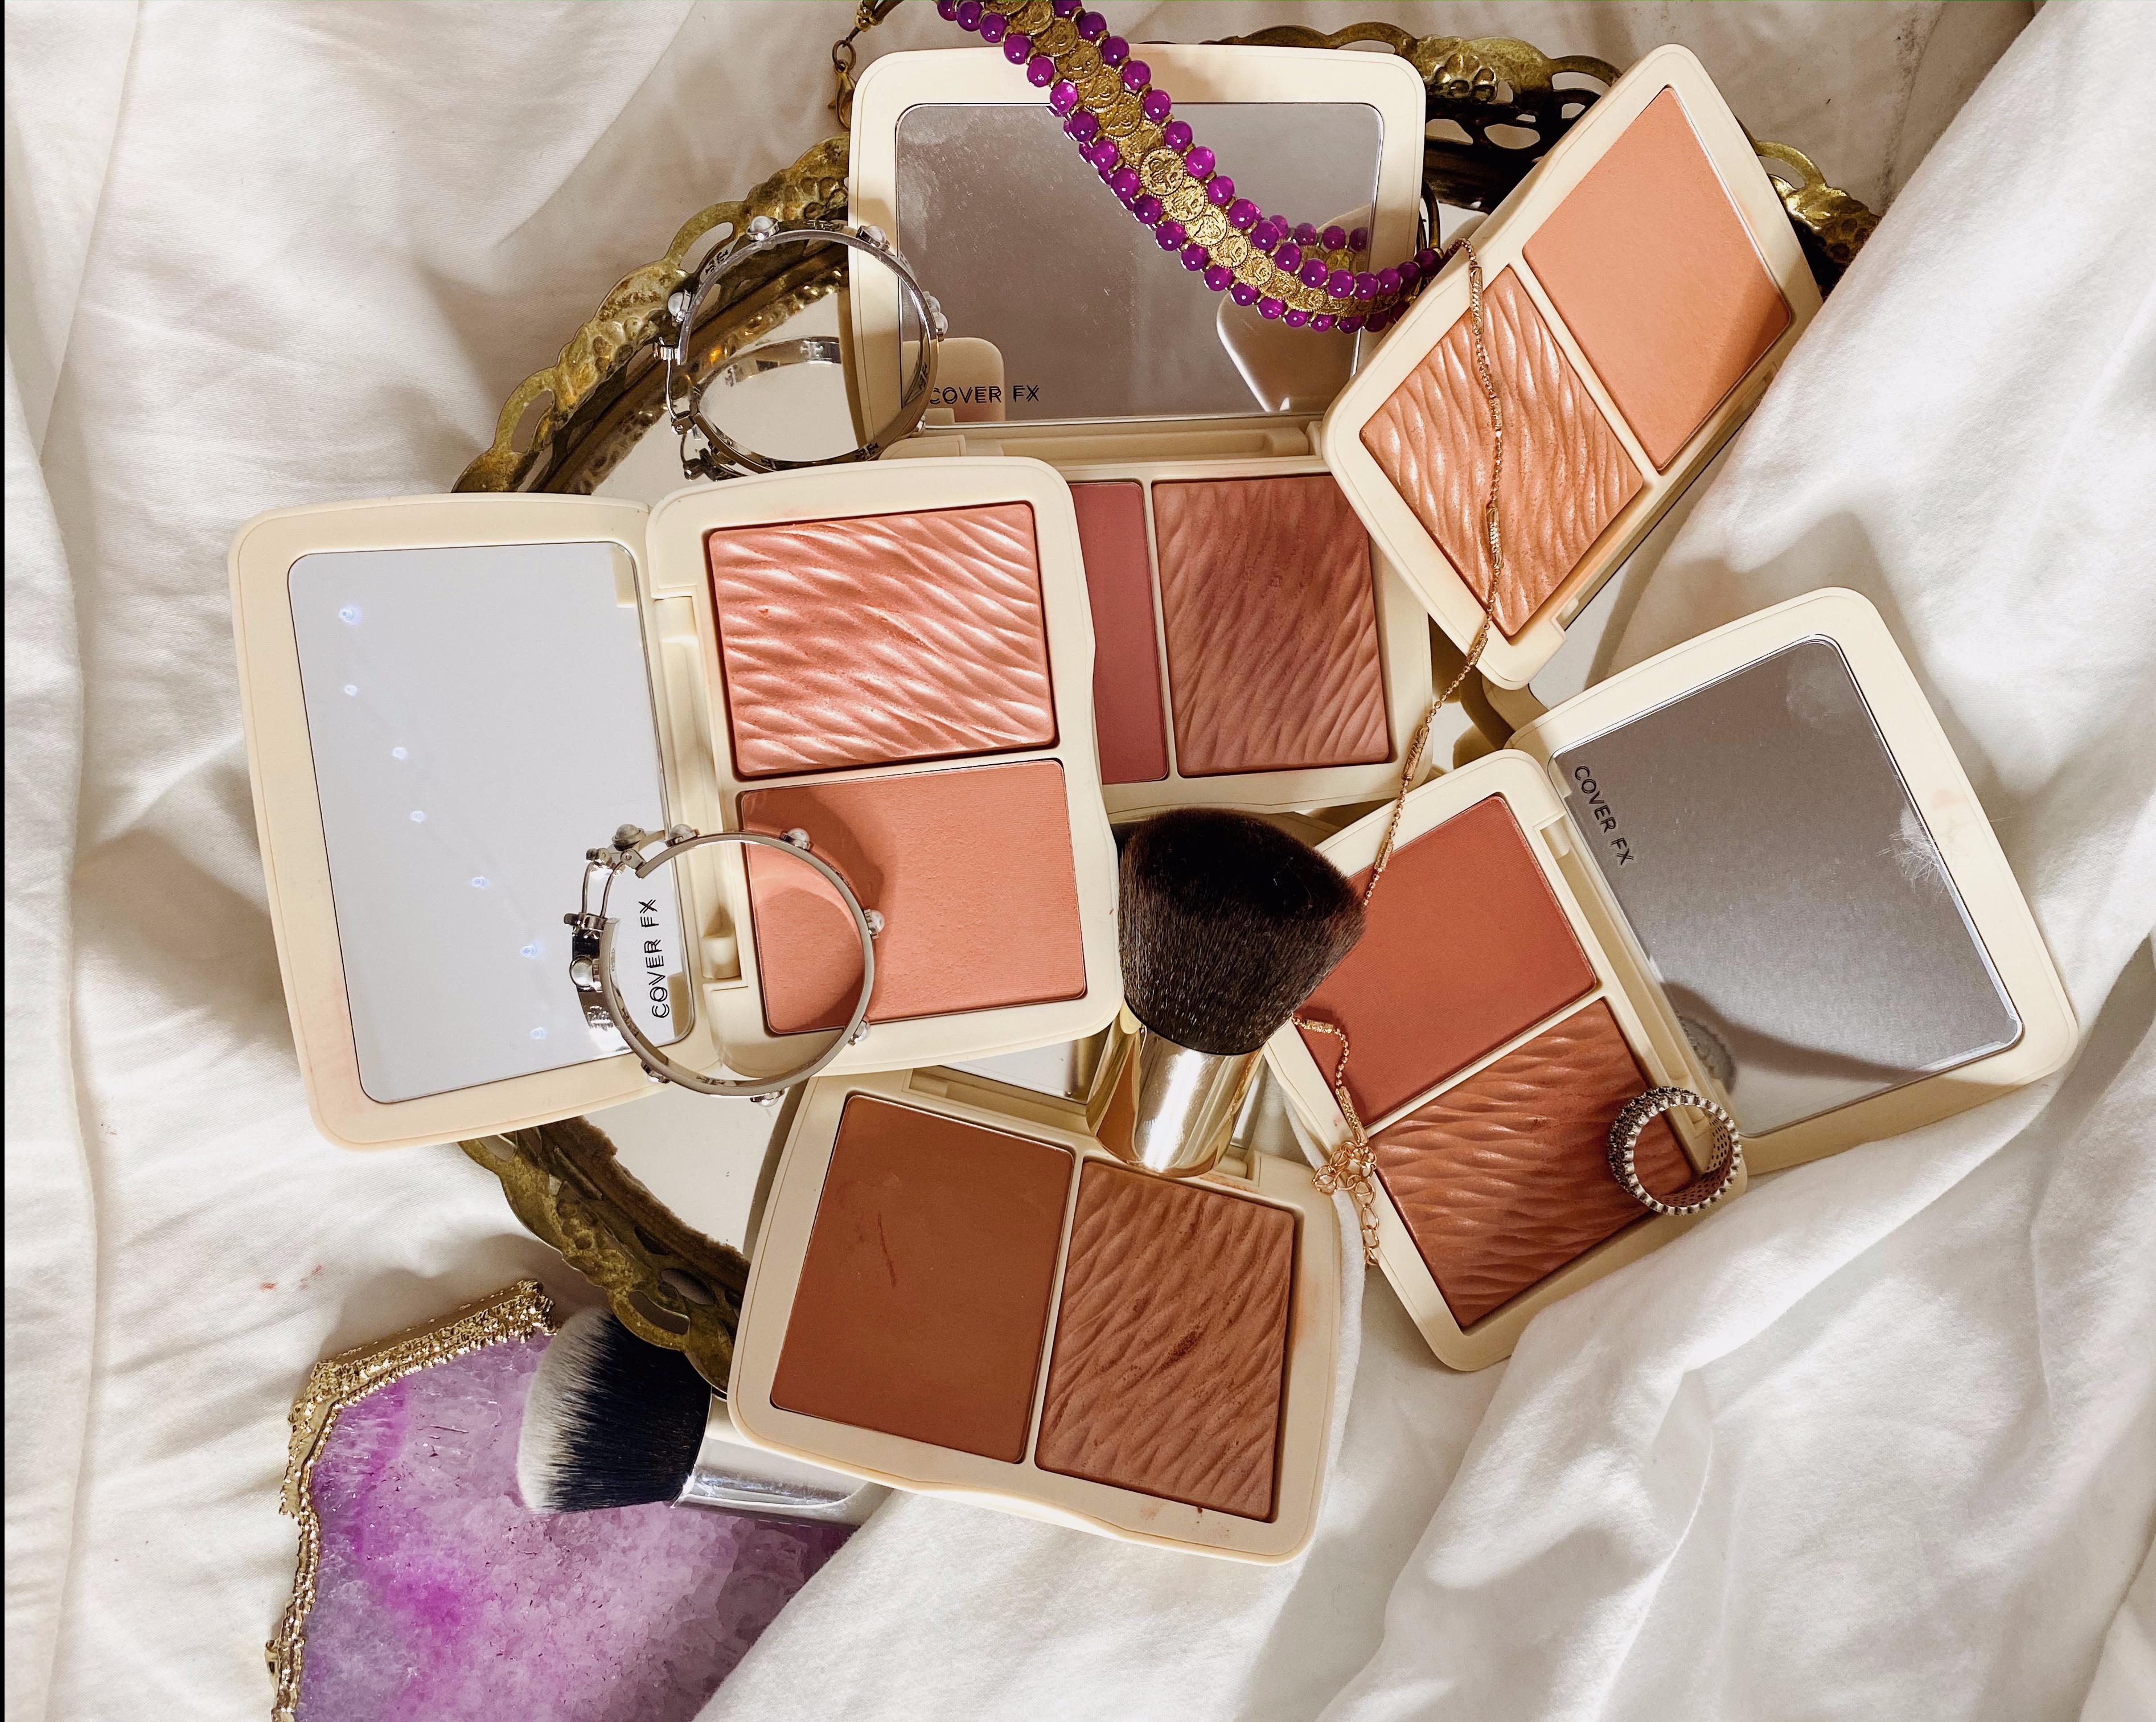 Cover FX Monochromatic Blush Duo Review - Soft Peach | Pink Dahlia | Mojave Mauve | Warm Honey | Spiced Cinnamon